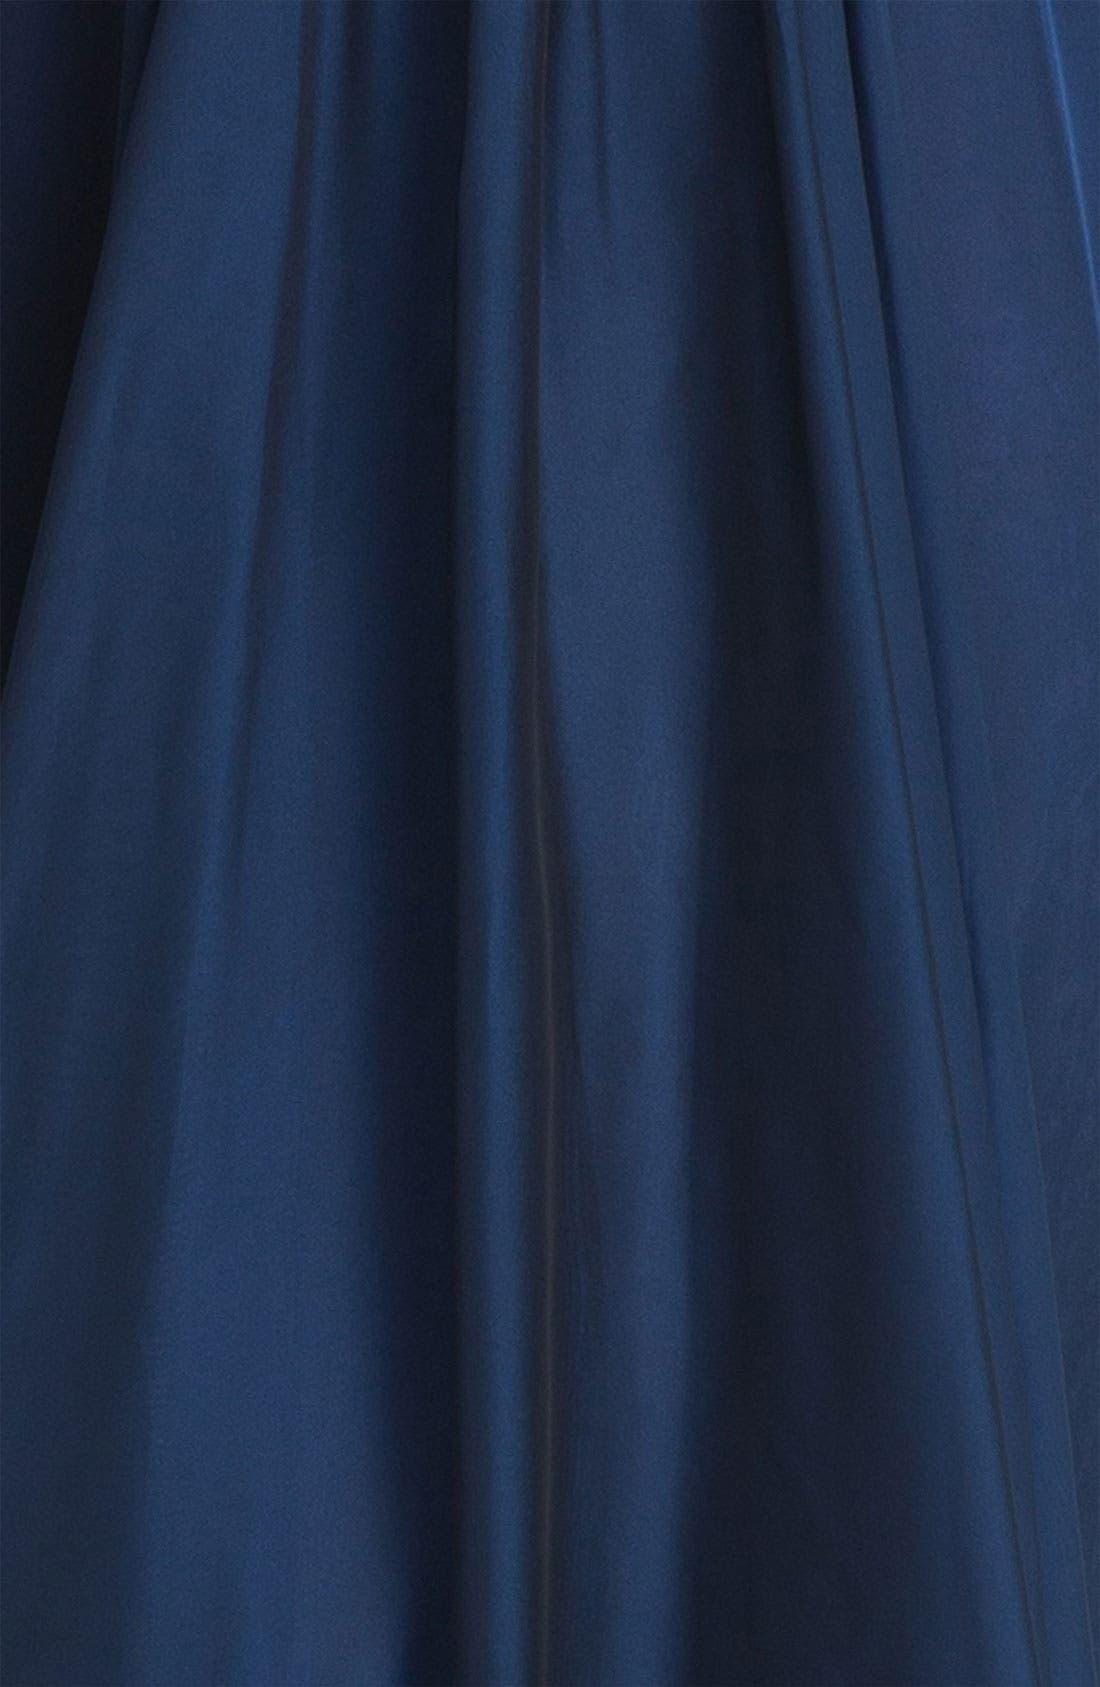 Alternate Image 3  - La Femme Embellished Chiffon Strapless Gown